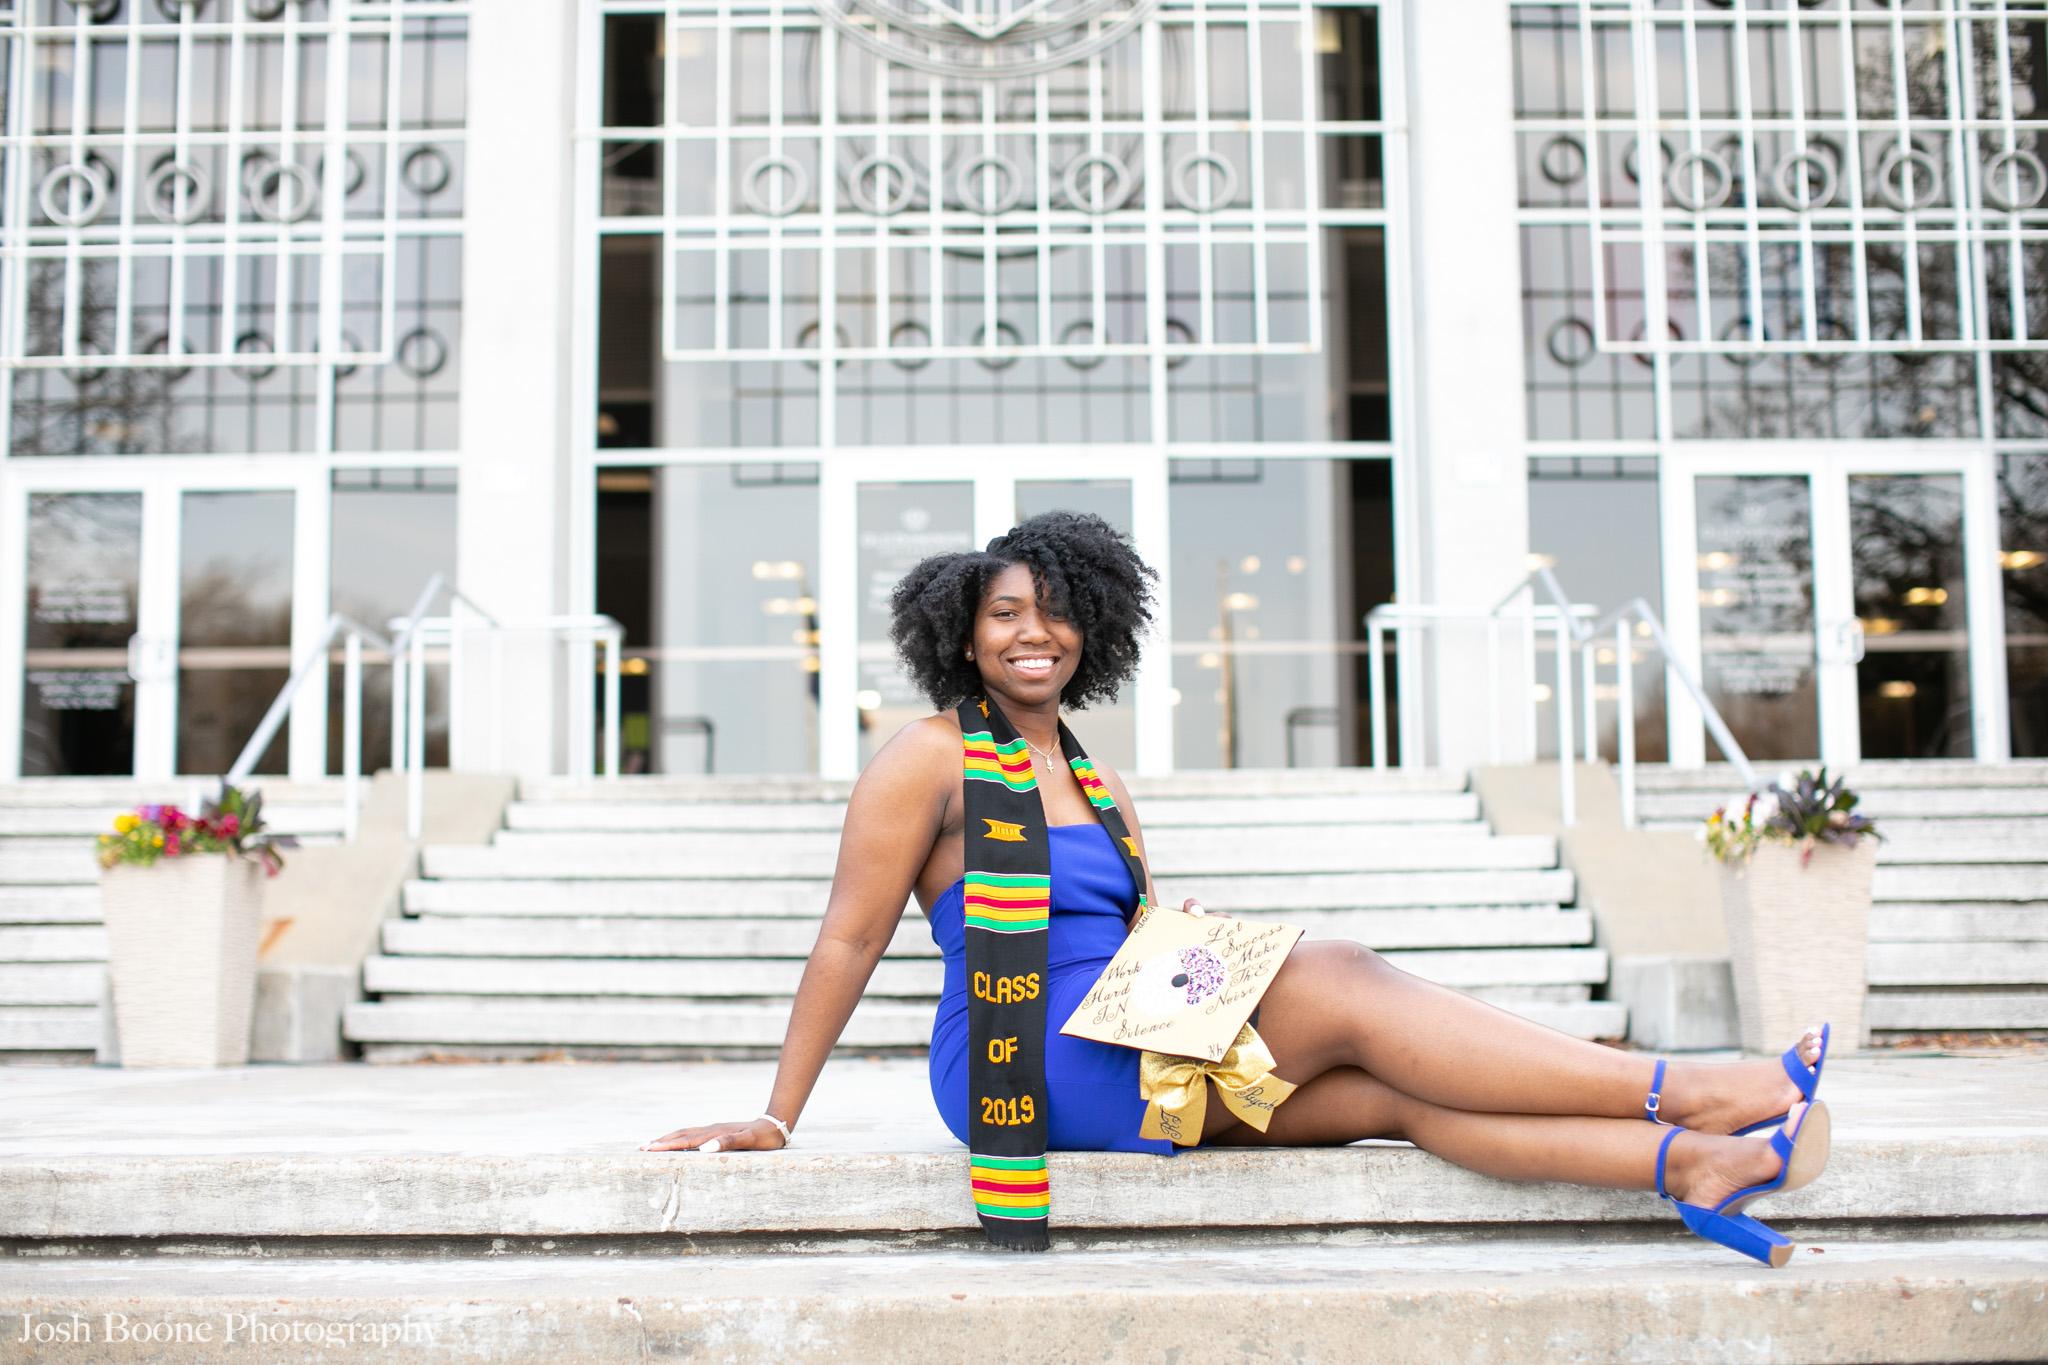 old_dominion_university_graduation_pictures-2.jpg